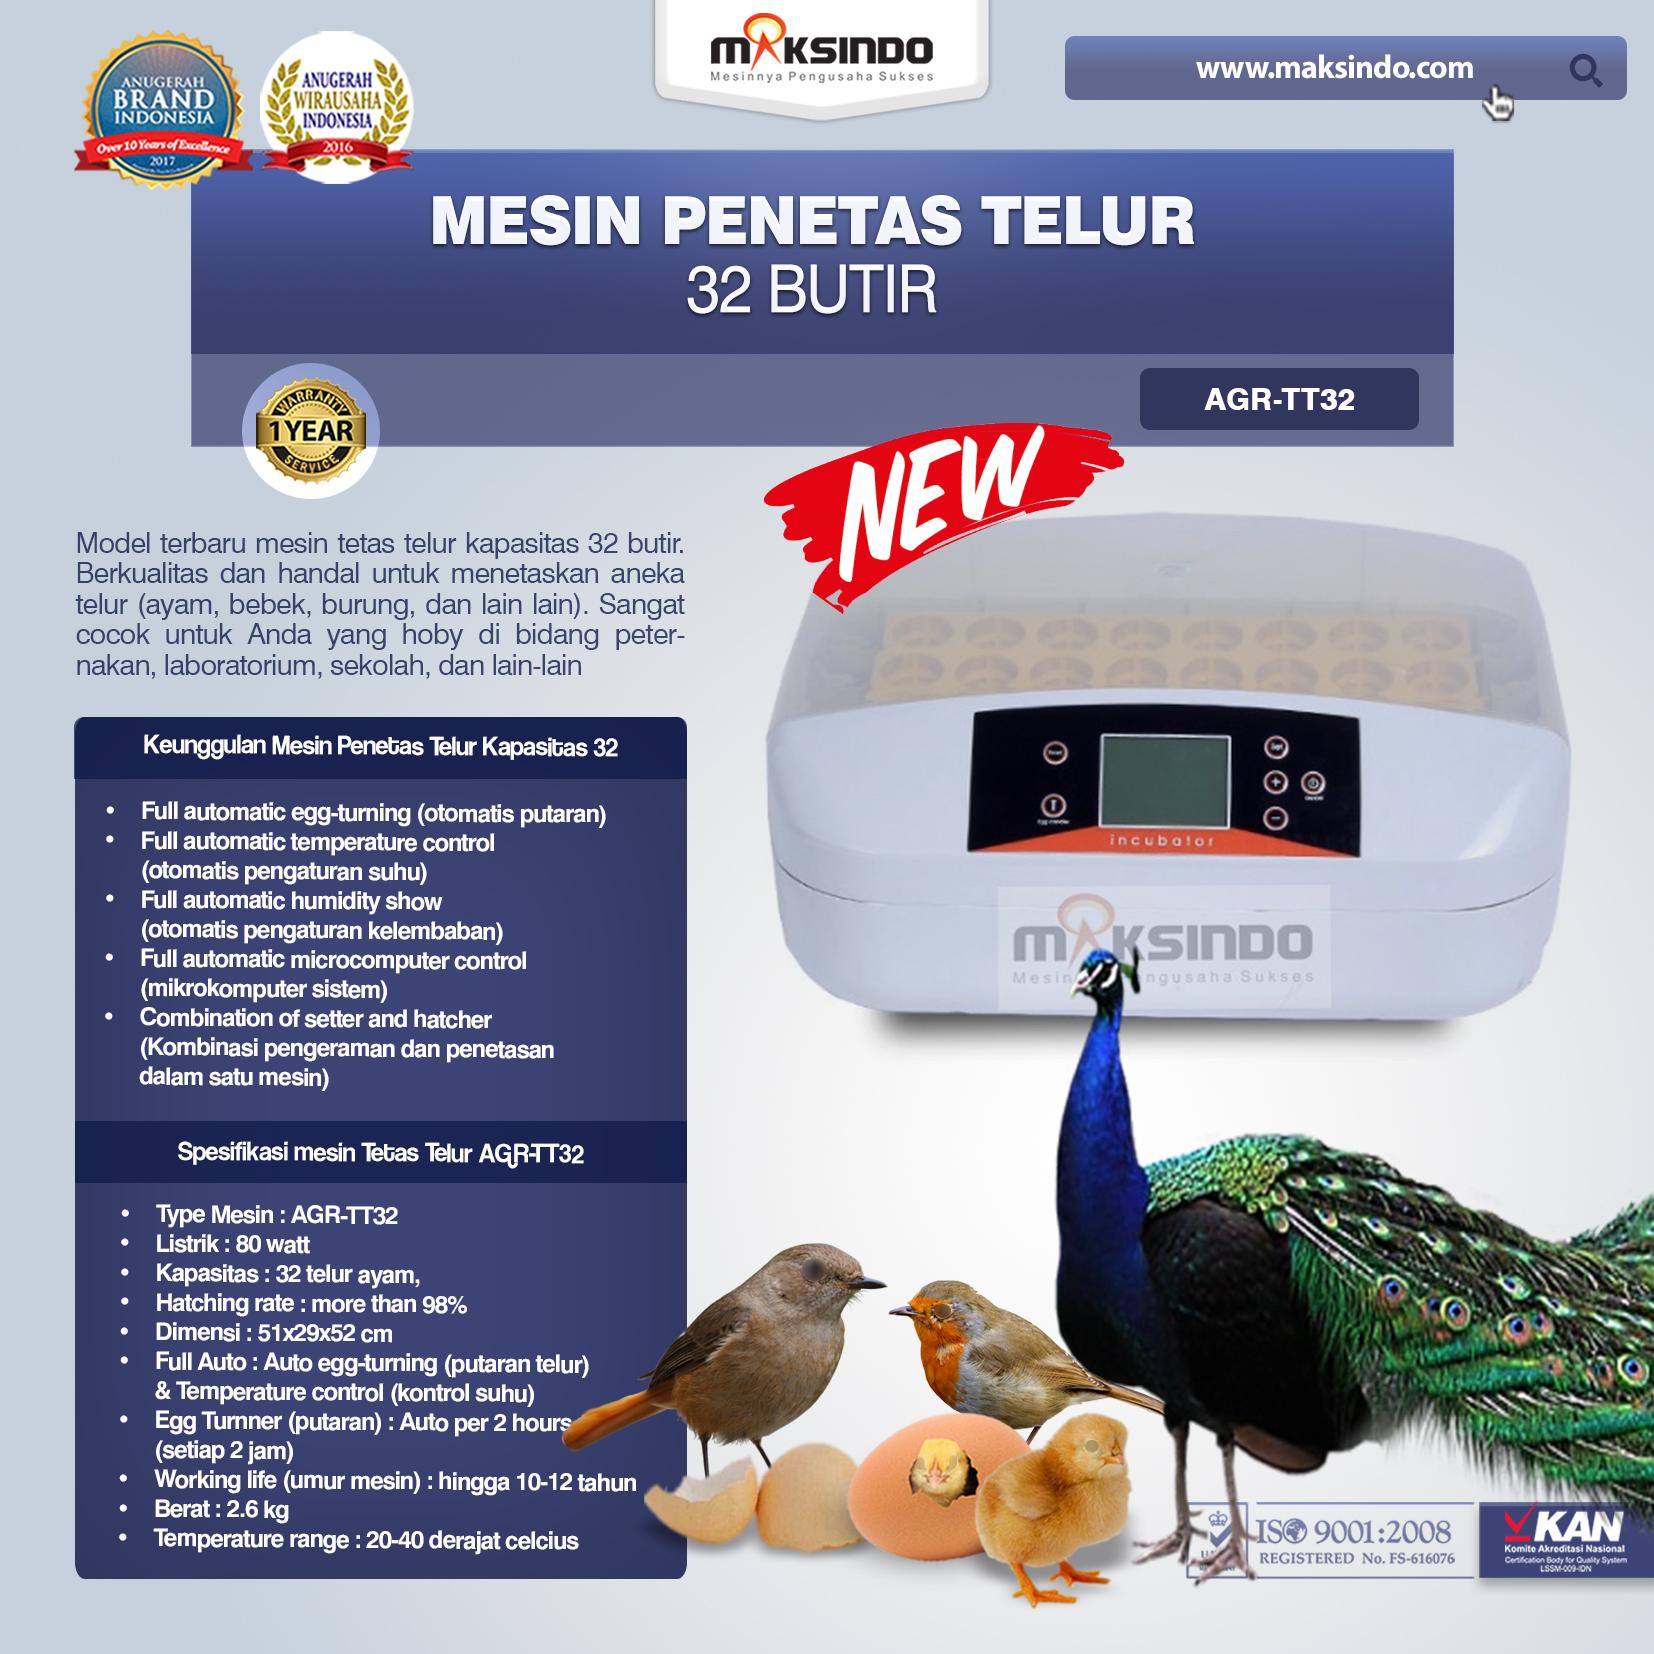 Mesin Penetas Telur 32 Butir AGR-TT32